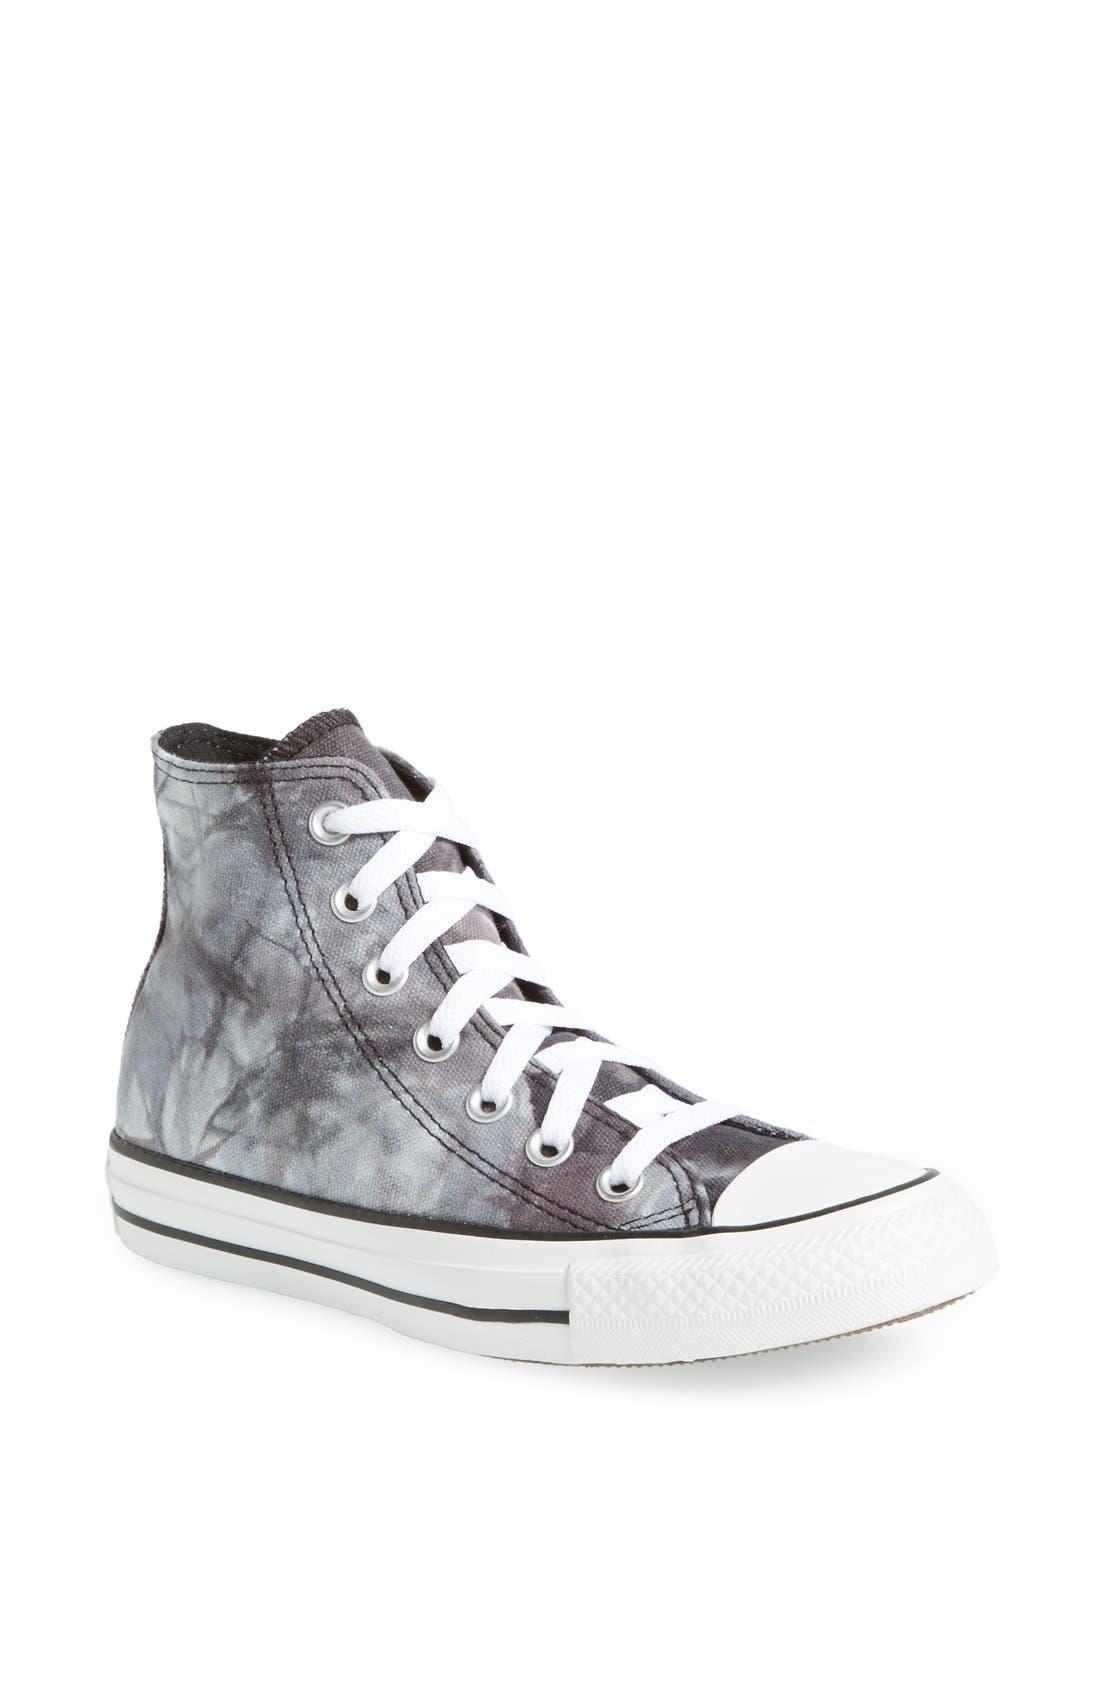 Main Image - Converse Chuck Taylor® All Star® 'Tie Dye' High Top Sneaker (Women)